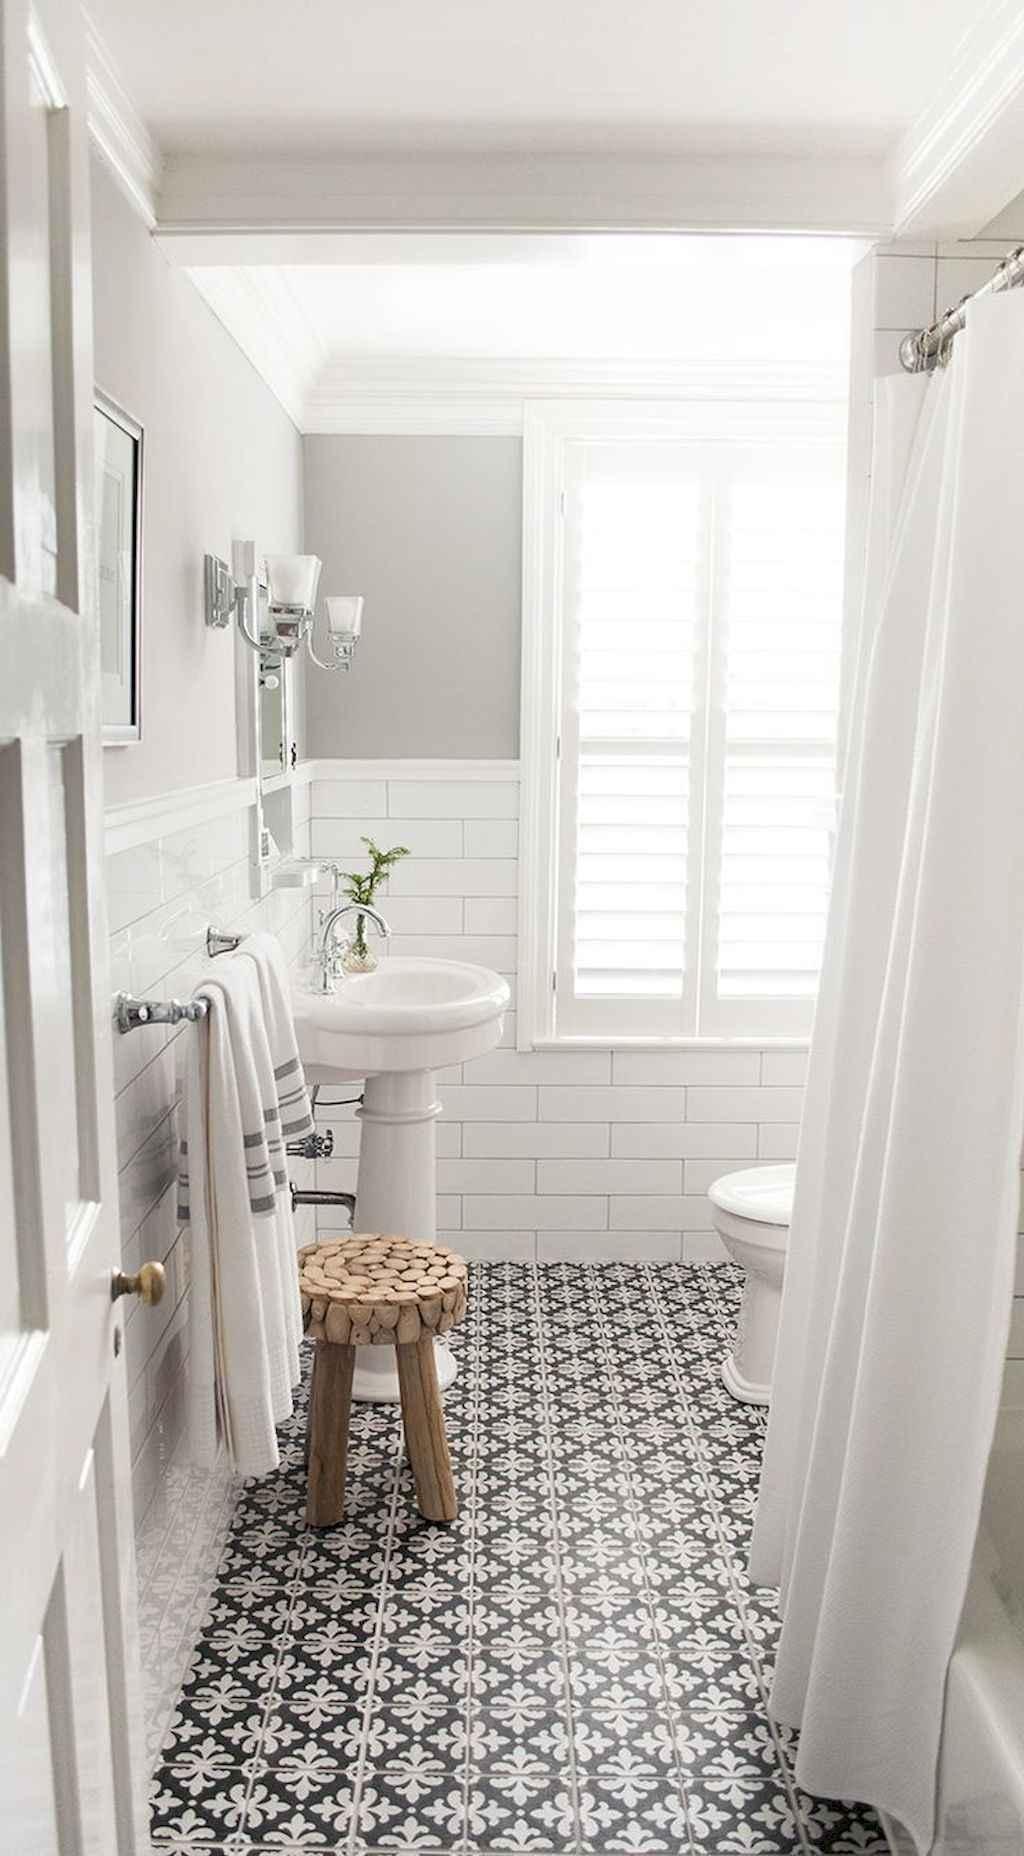 111 Brilliant Small Bathroom Remodel Ideas On A Budget (18)